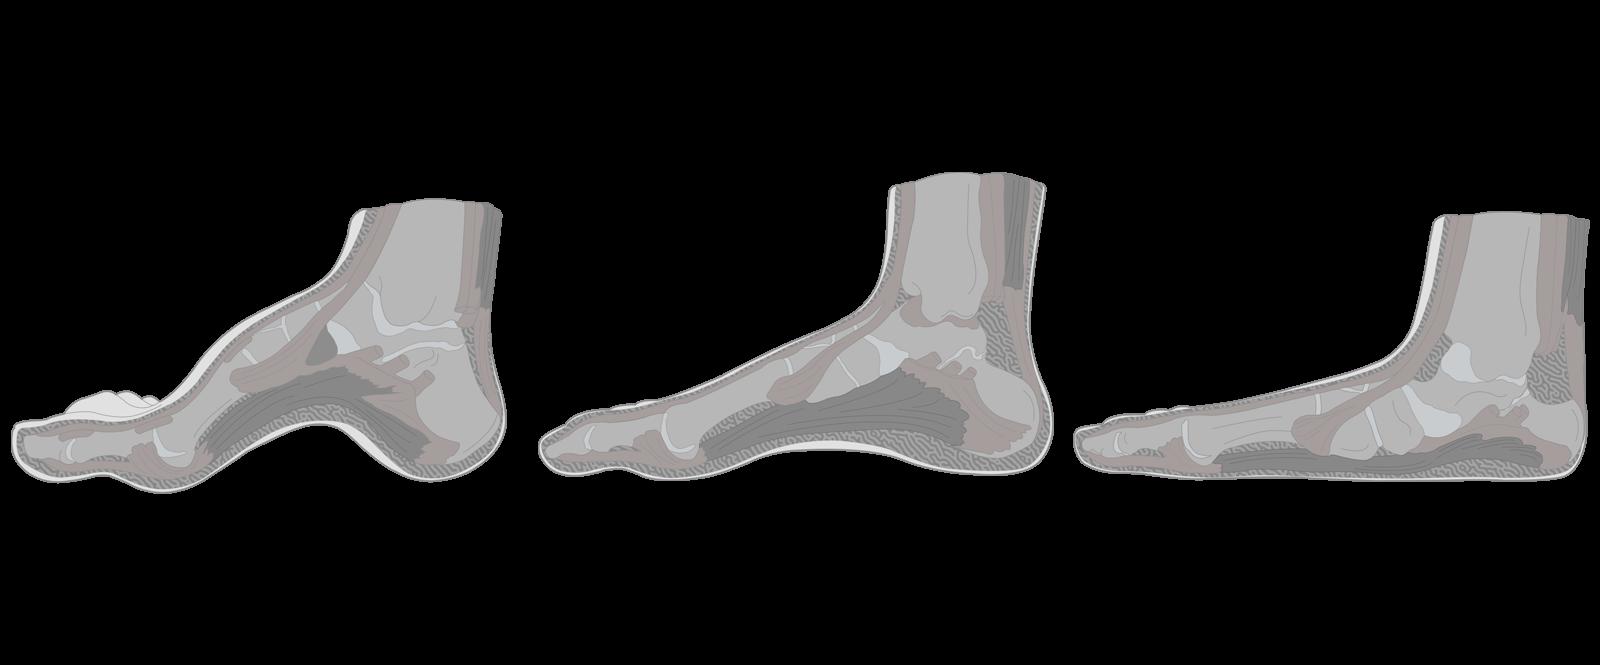 https://dubaipodiatry.com/wp-content/uploads/2021/09/Slider-New-Images_Flat-Feet-1.png